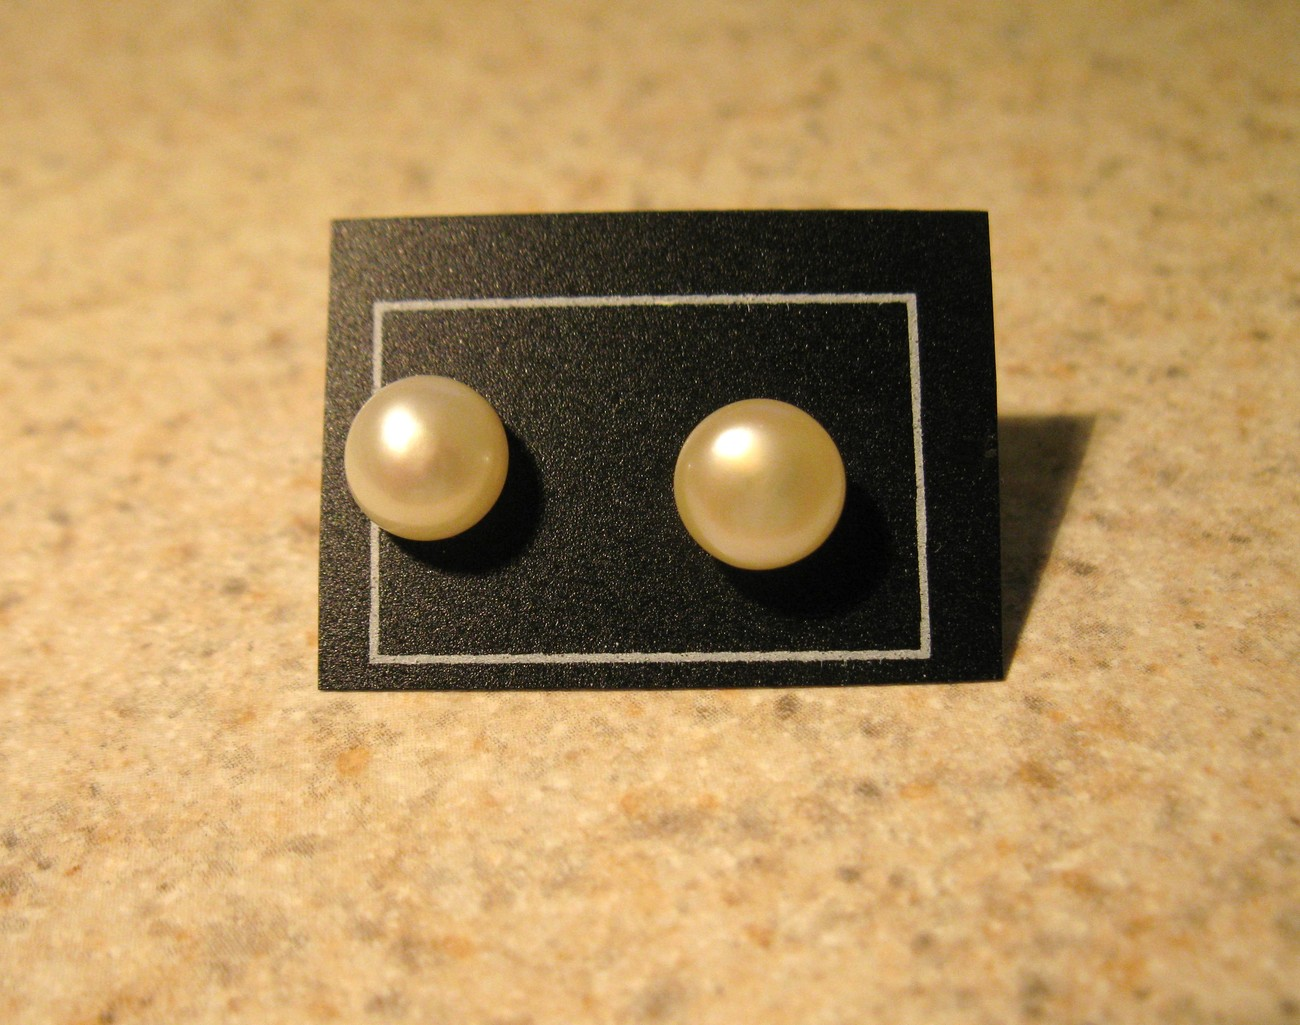 276 white pearl studs